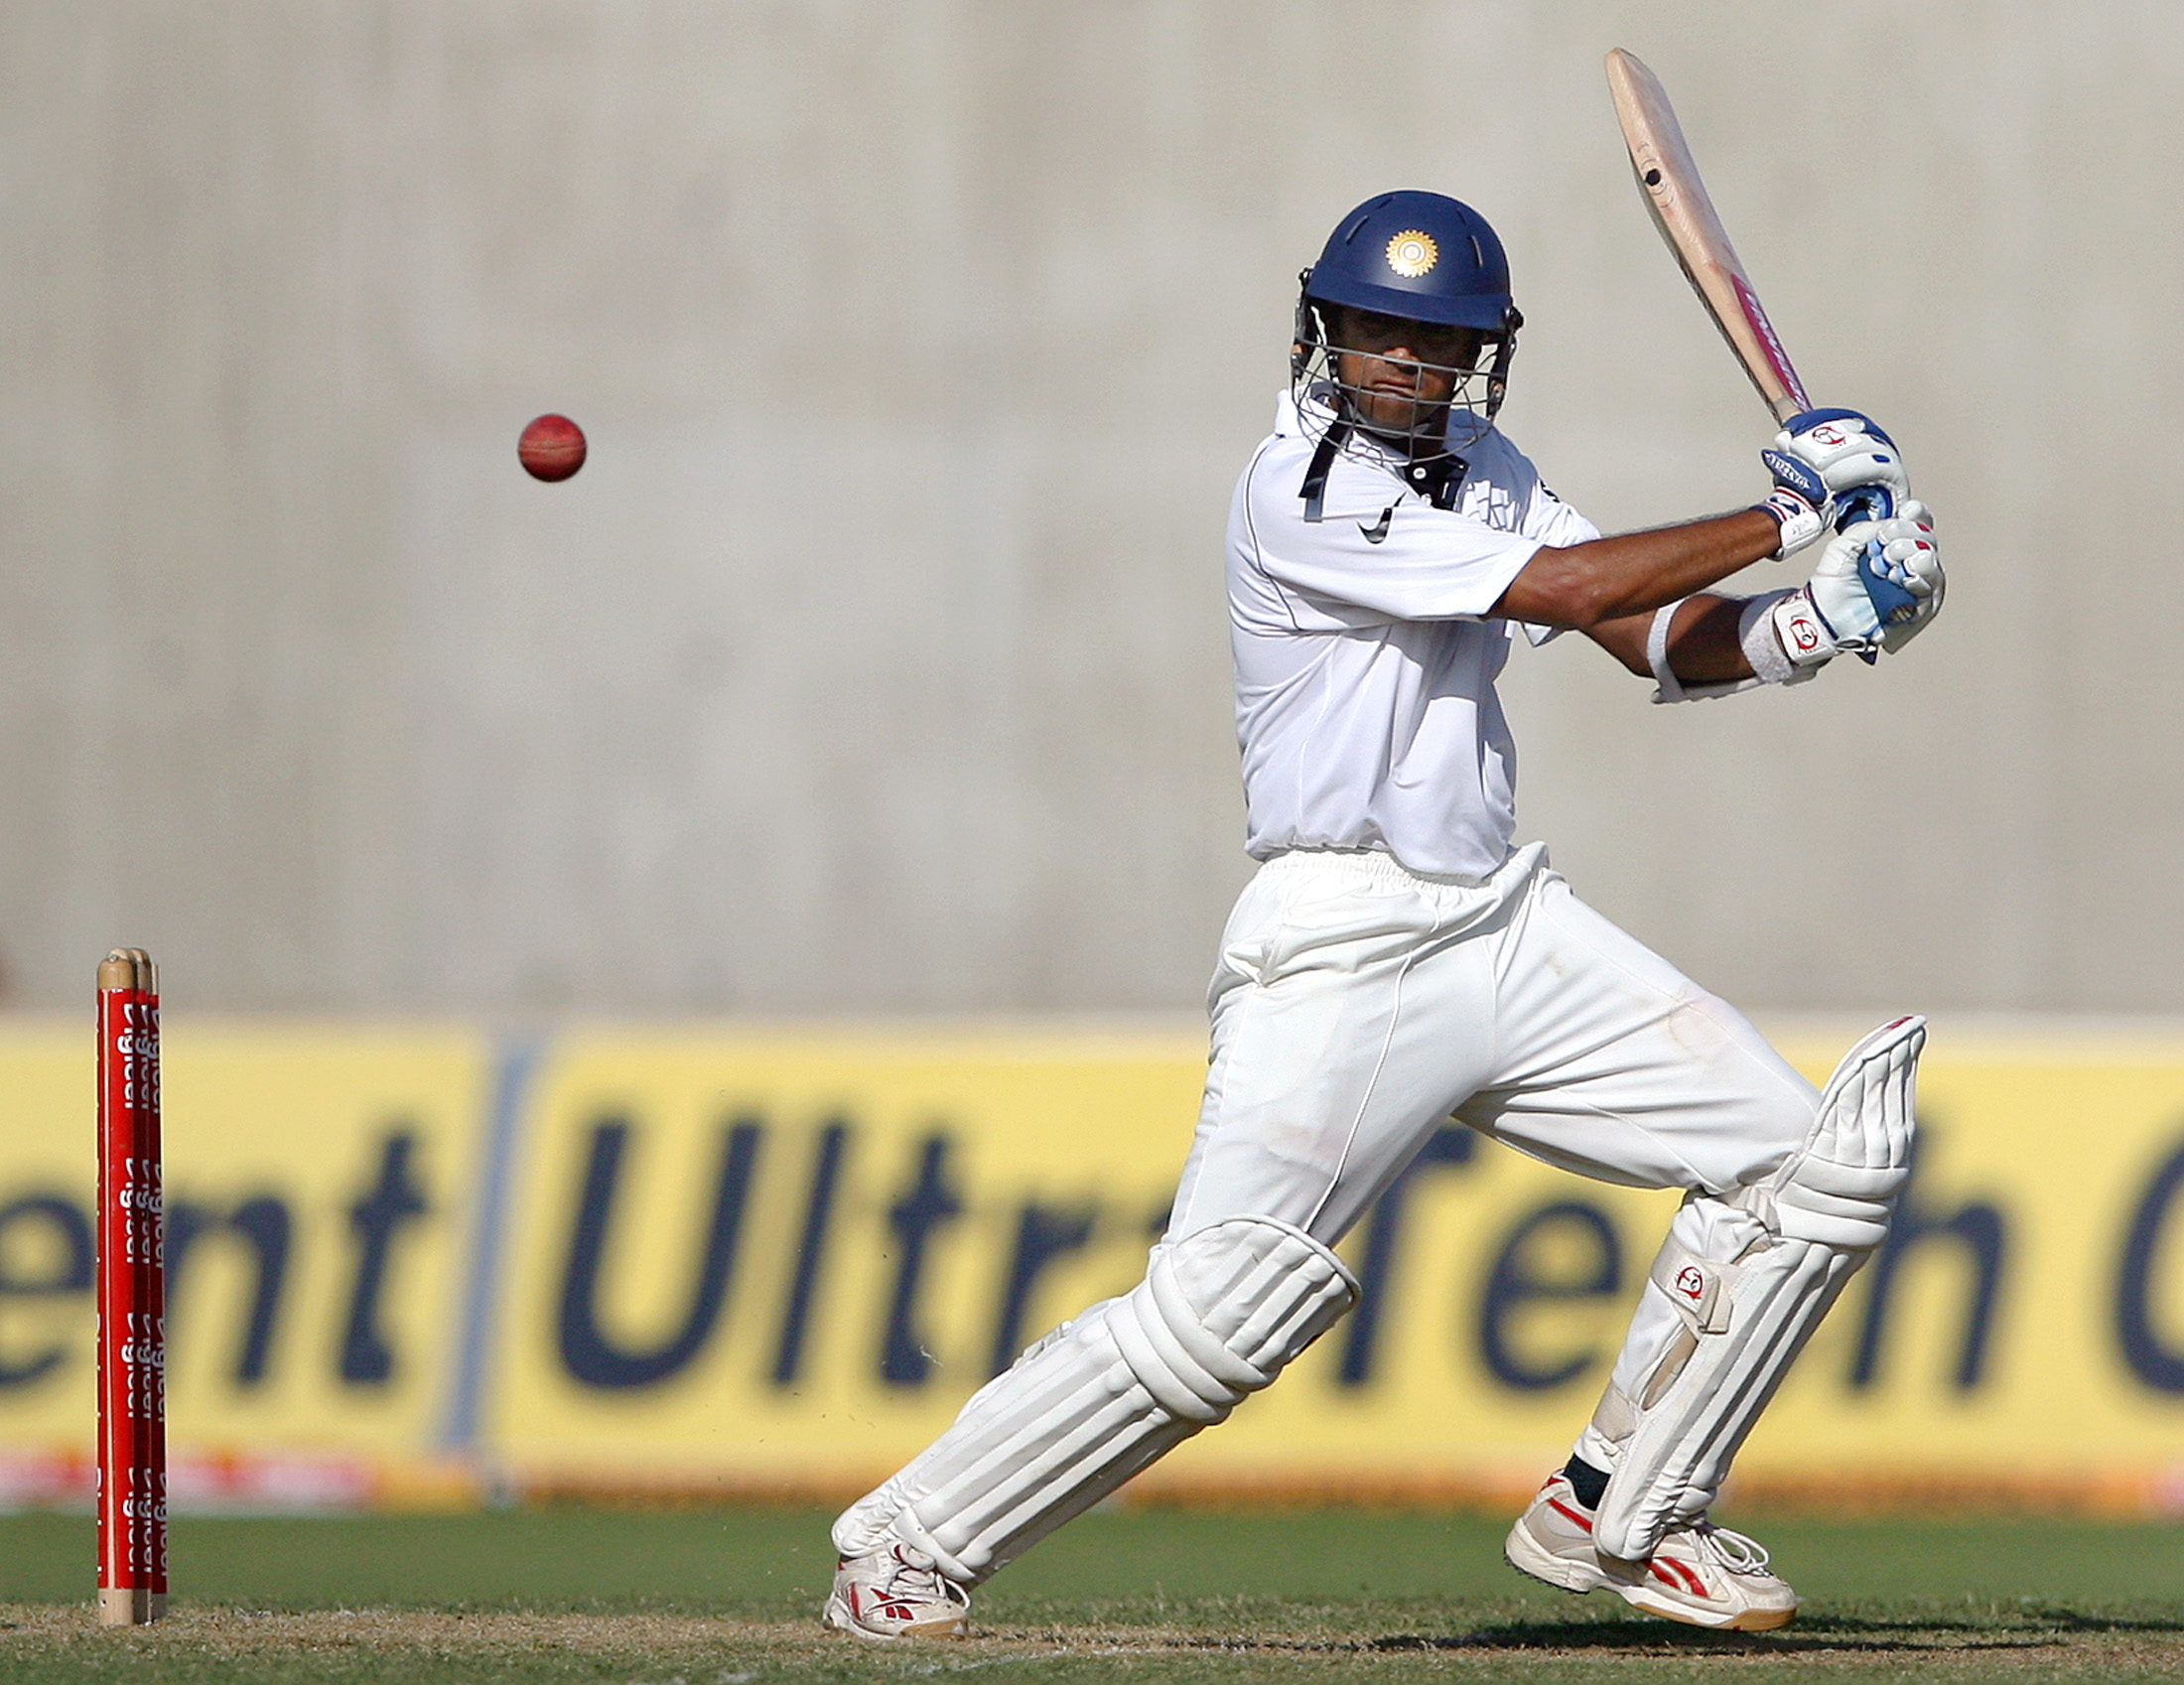 Rahul dravid bating photos